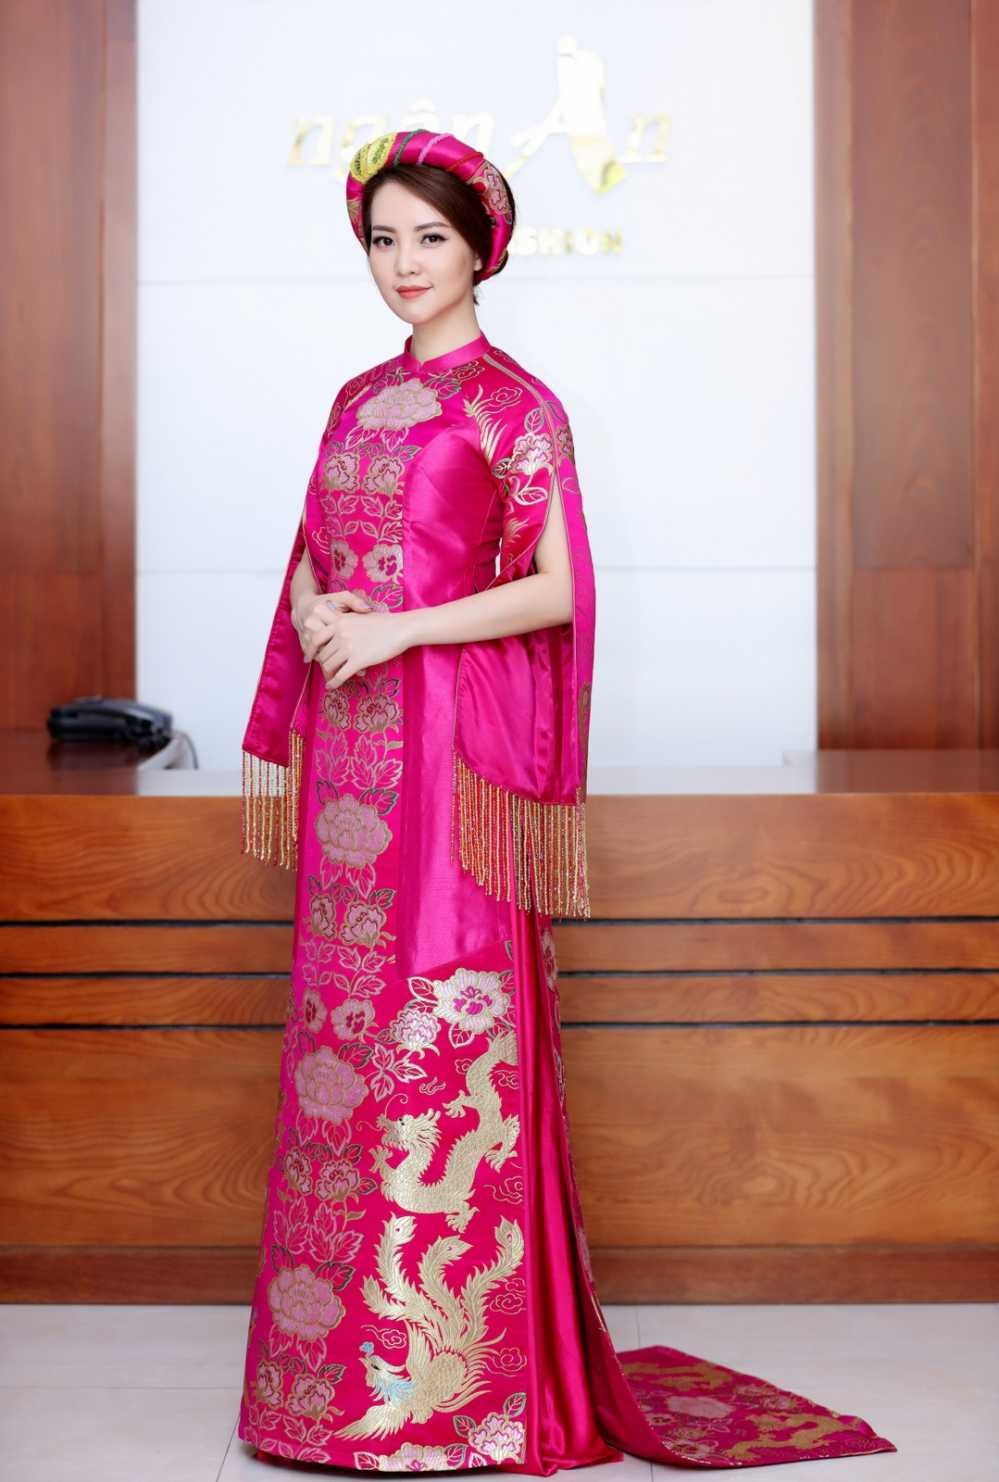 Thuy Van thu vay ao chuan bi lam MC chung ket Hoa hau Viet Nam 2016 hinh anh 4